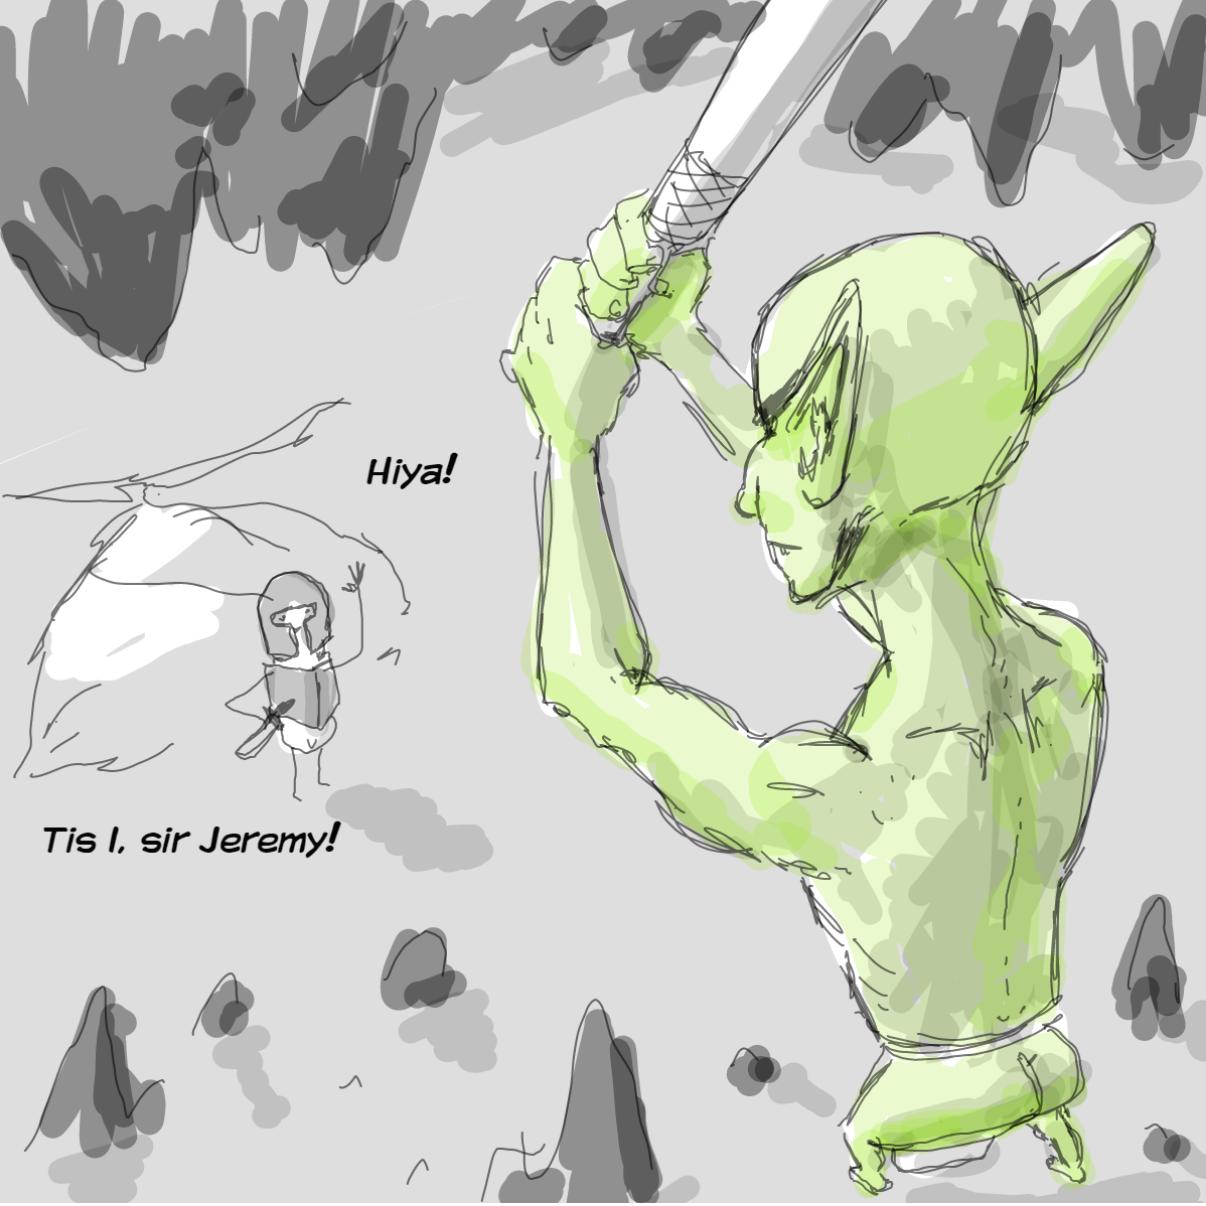 Drawing in Goblin by Potato Man